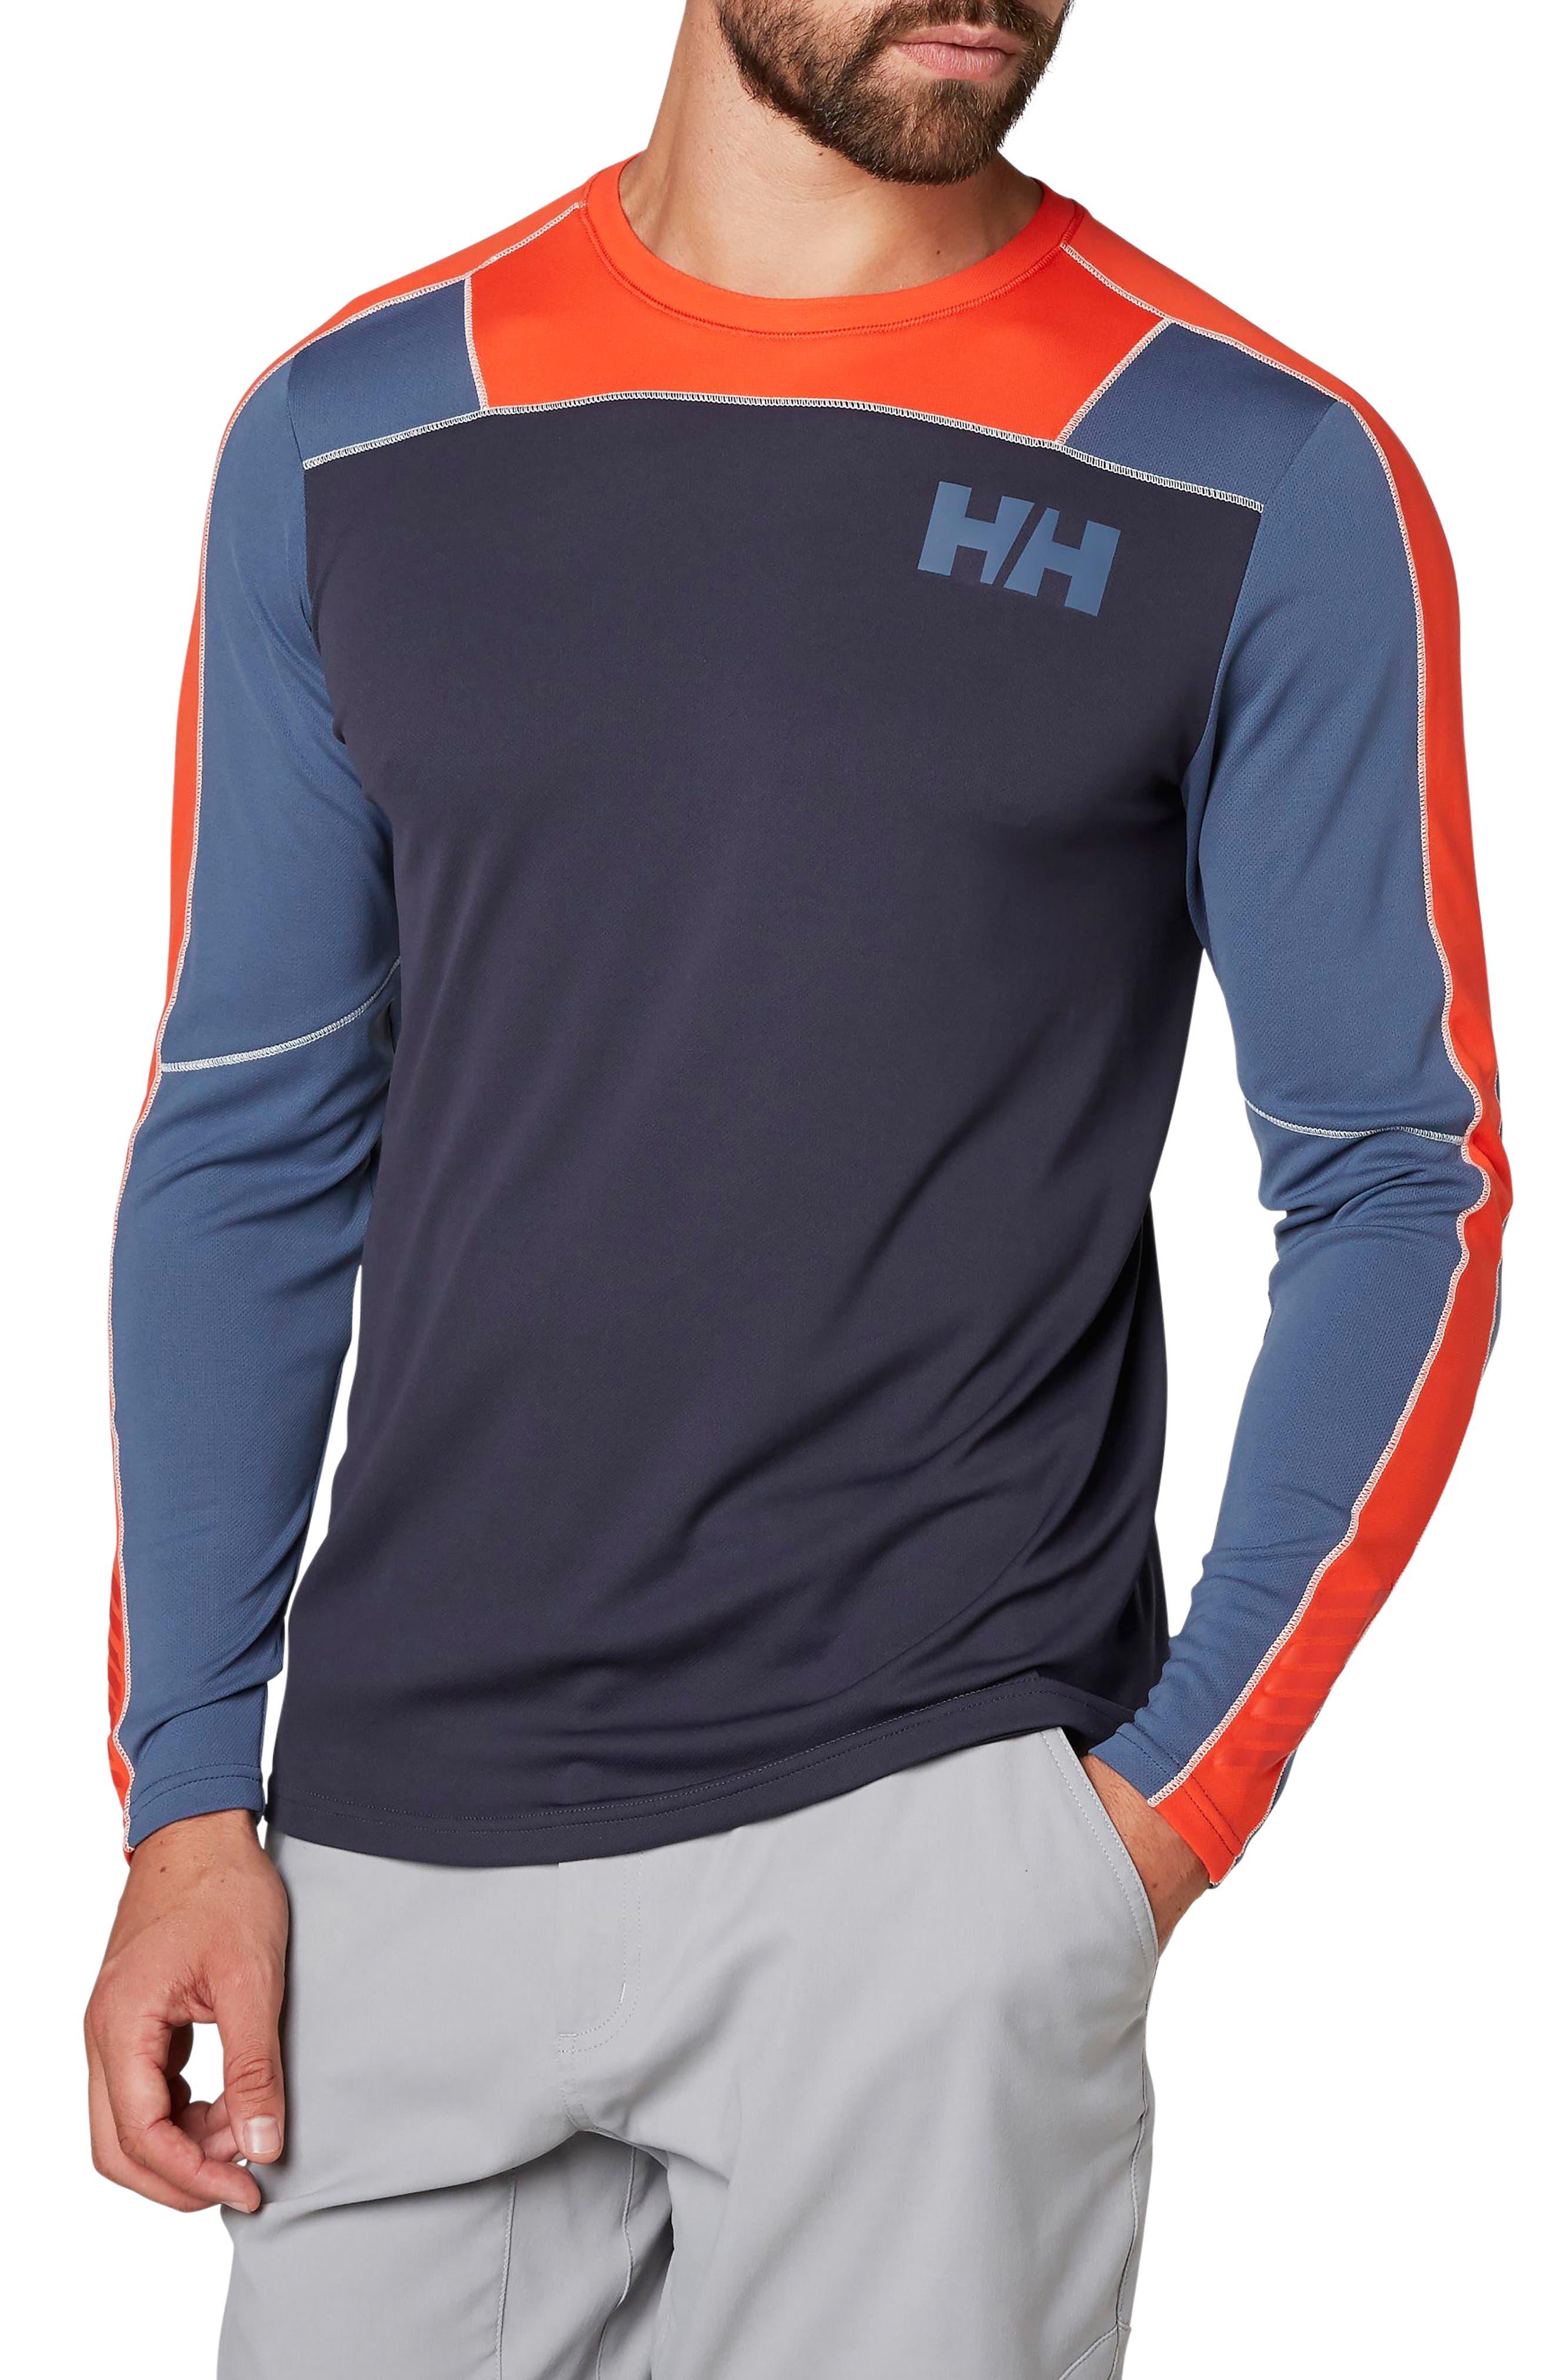 HH<sup>®</sup> Lifa Active Light Long Sleeve T-Shirt,                         Main,                         color, 400